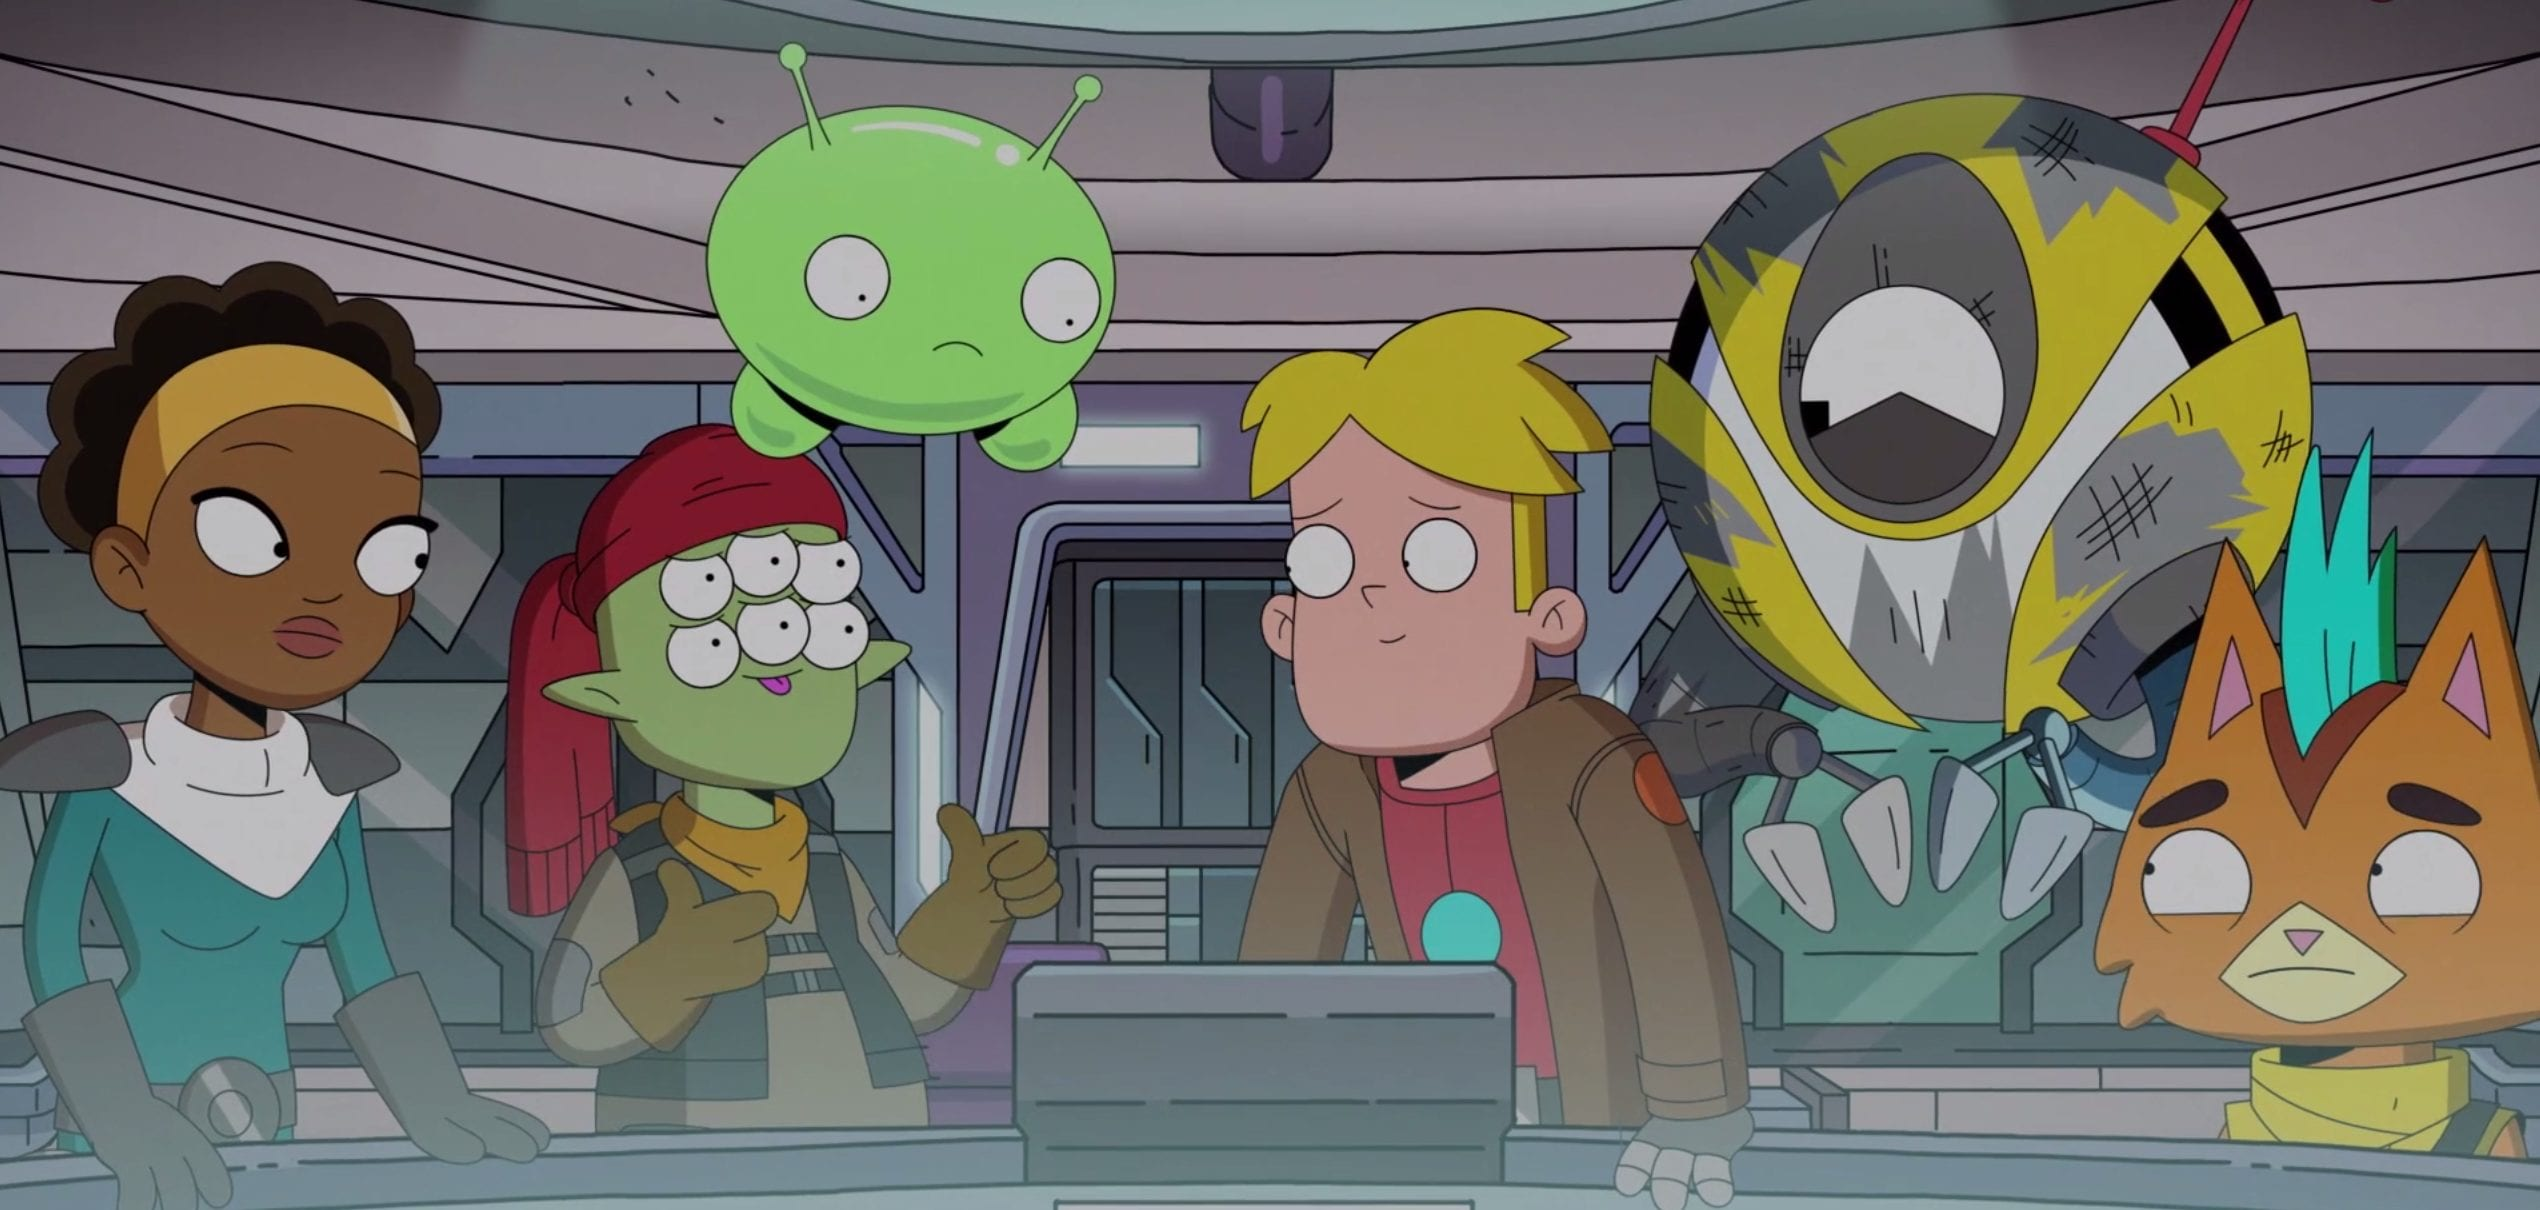 Final Space Season 2 Episode 5